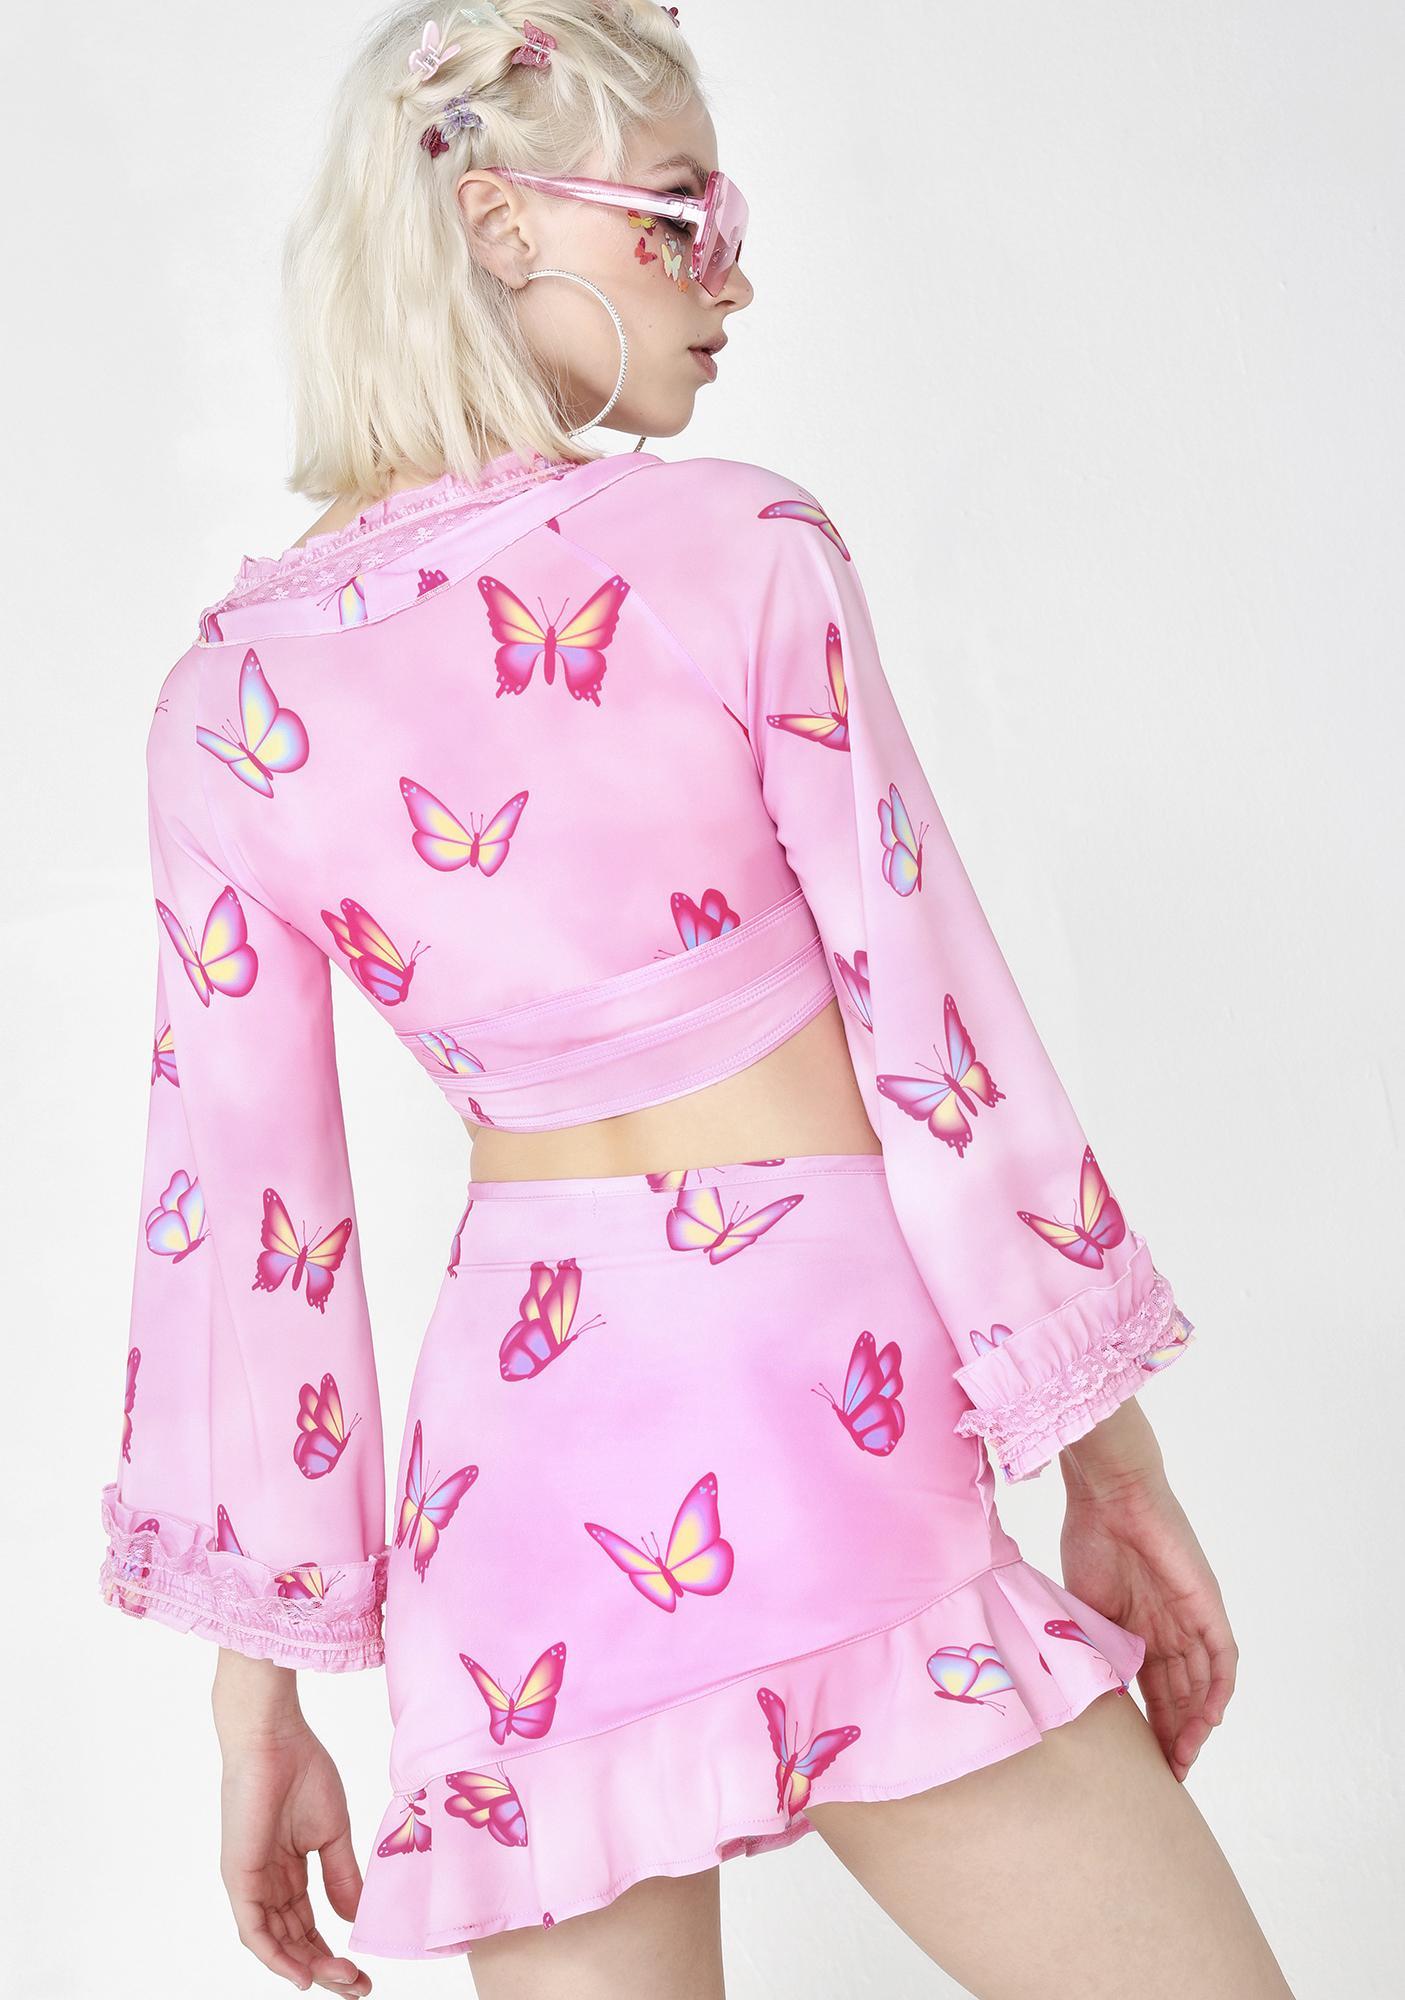 Sugar Thrillz Pampered Pixie Butterfly Skirt